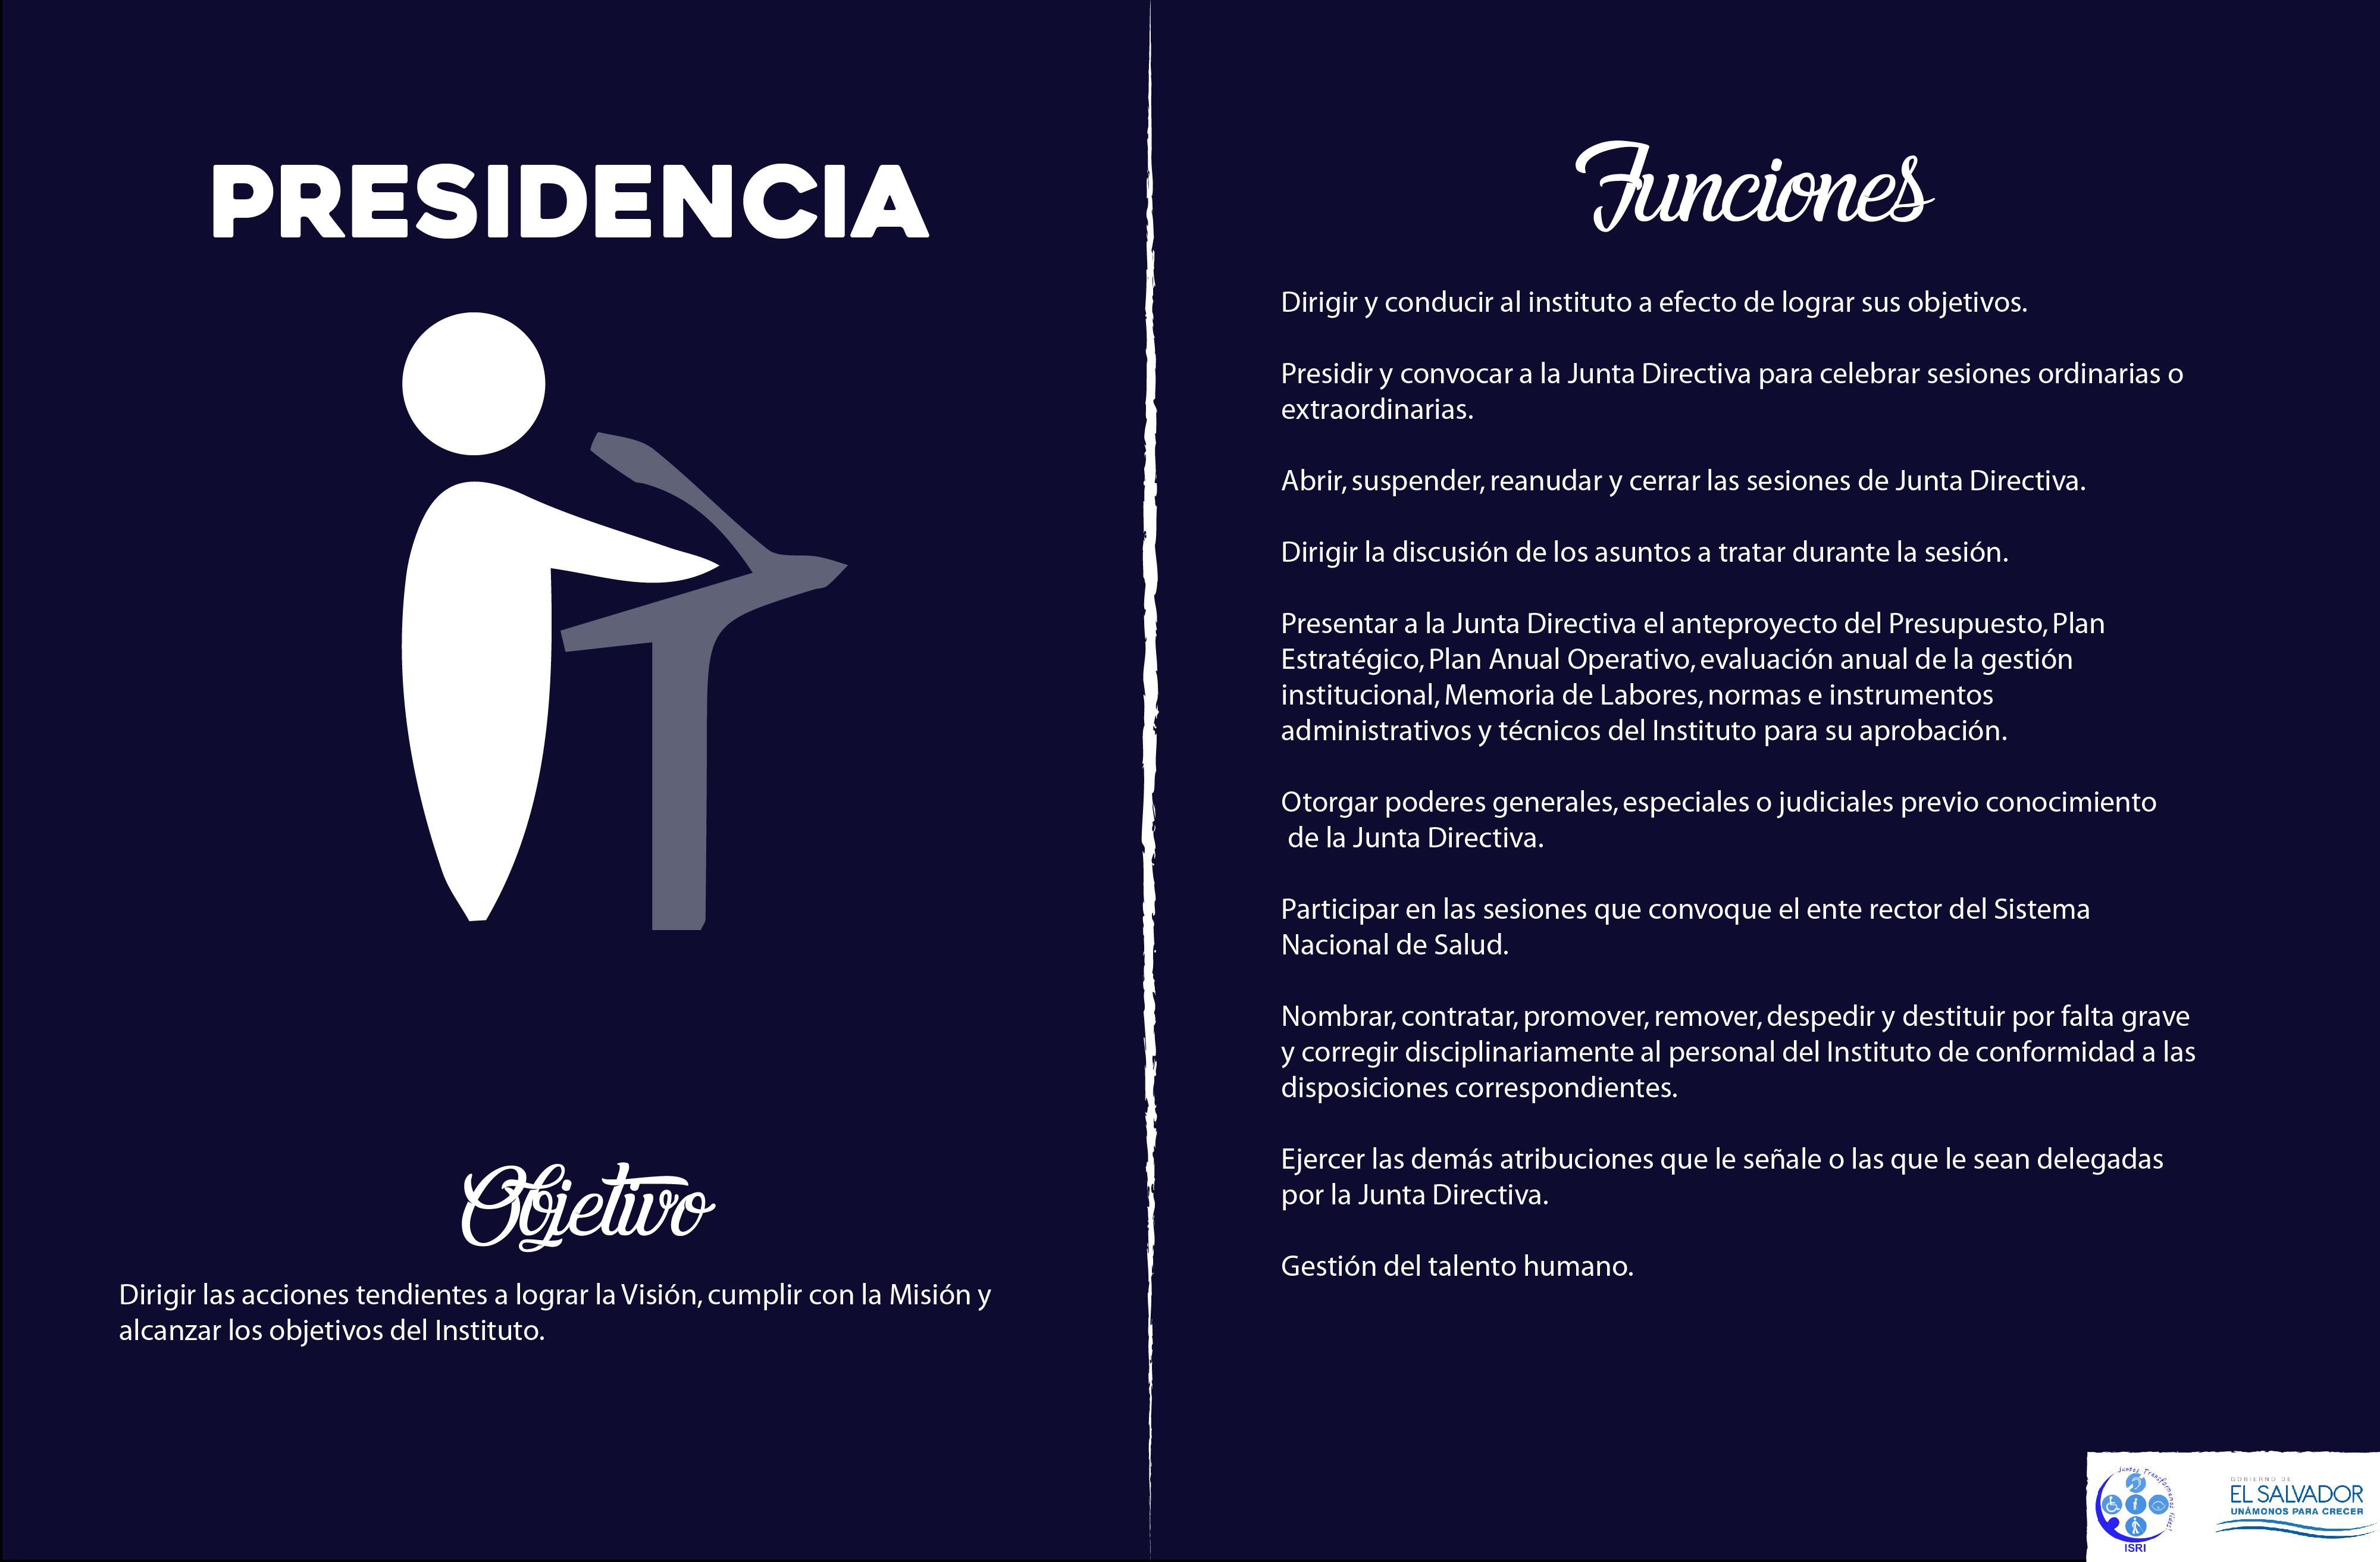 PRESIDENCIA-02